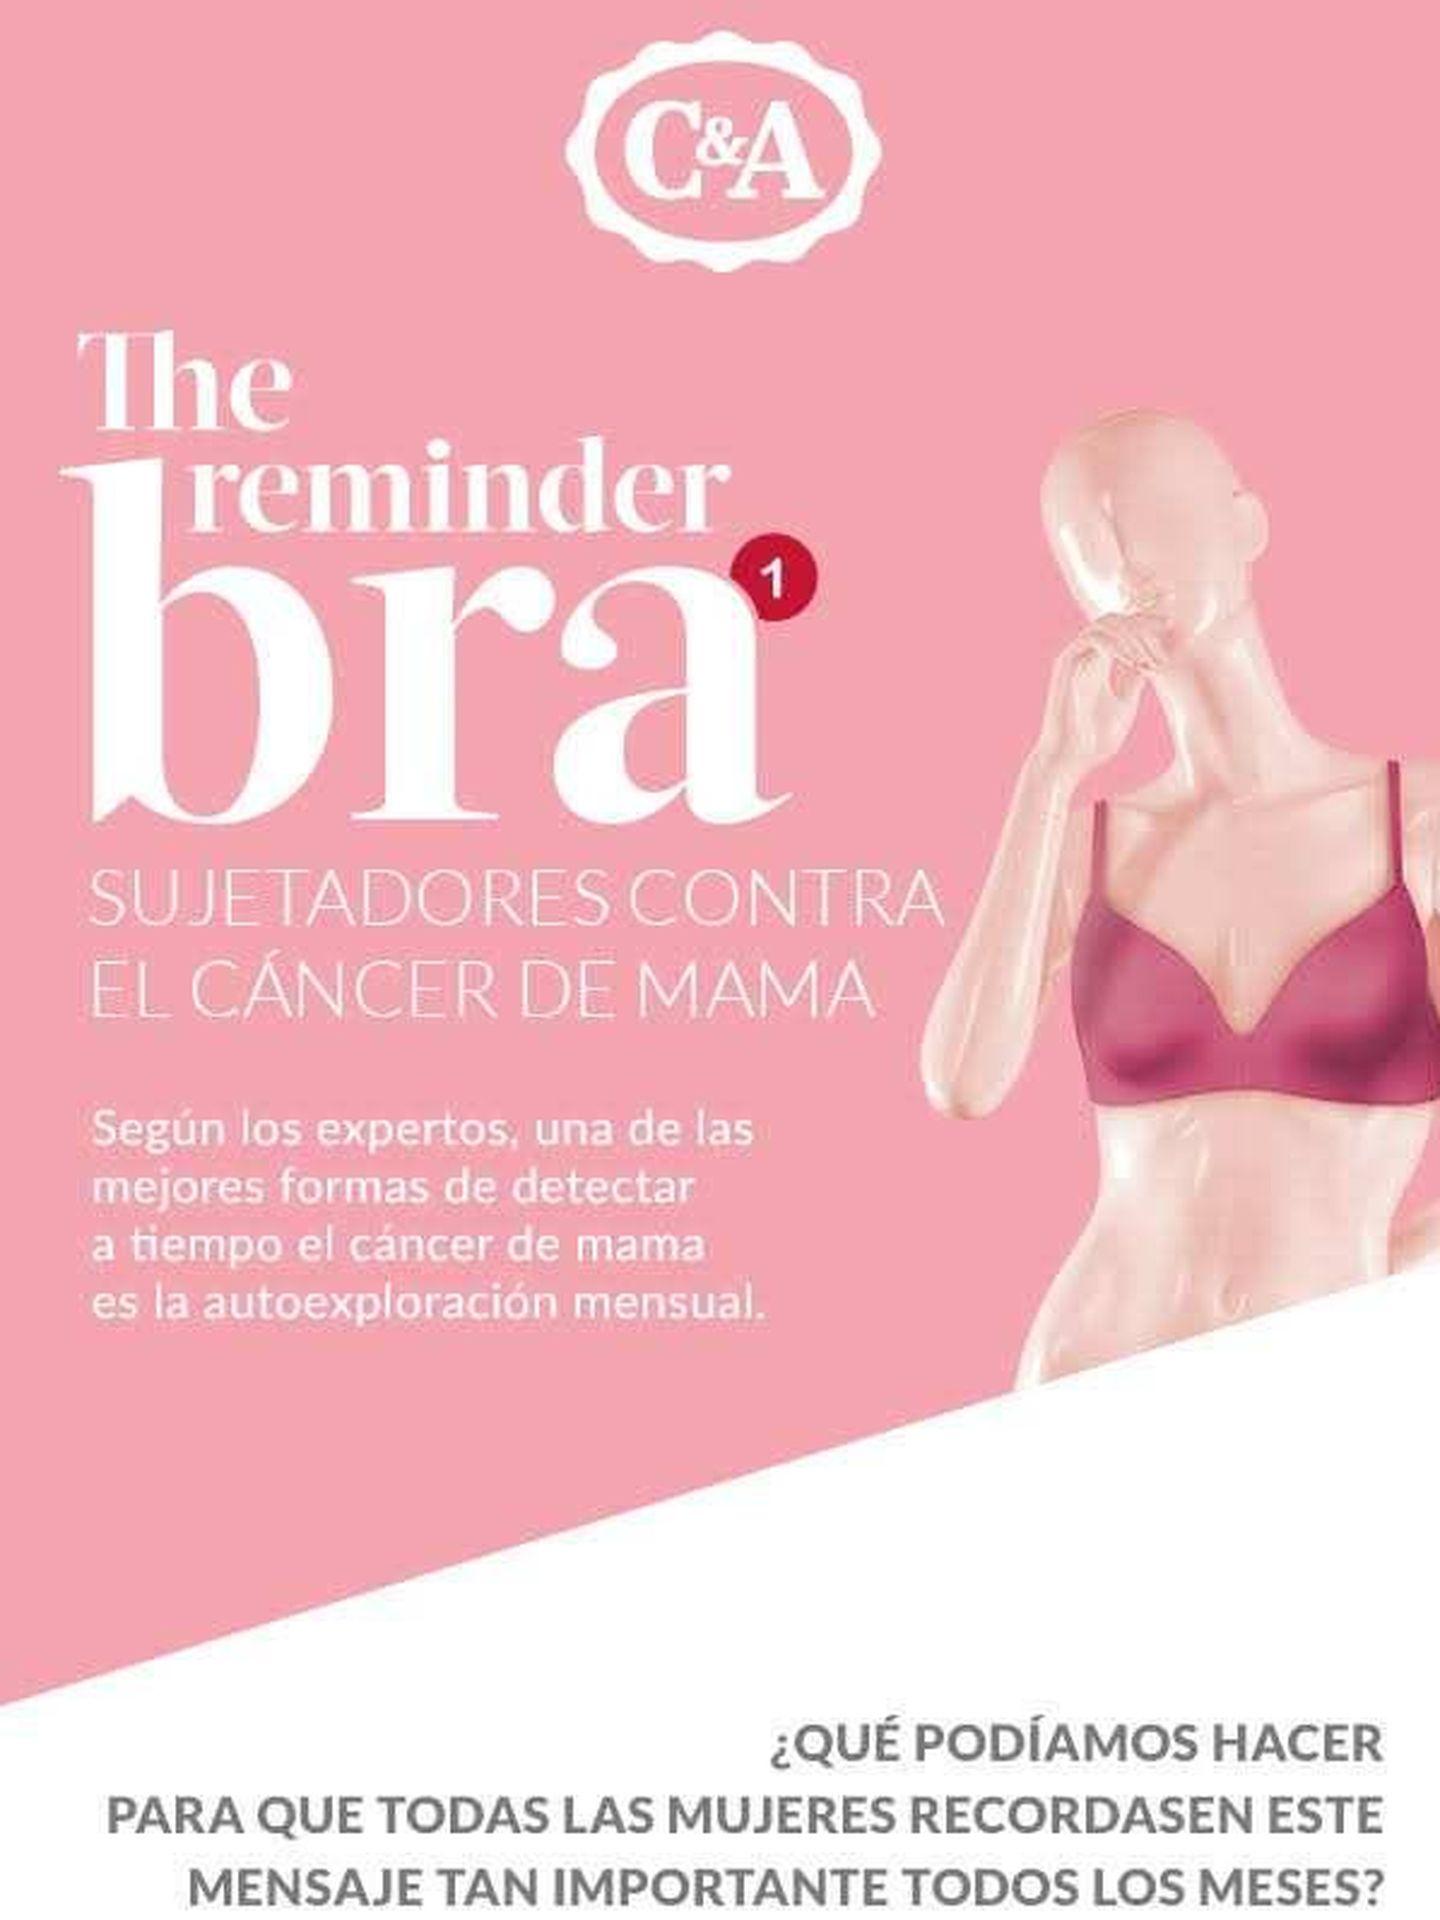 'Reminder Bra' de C&A.